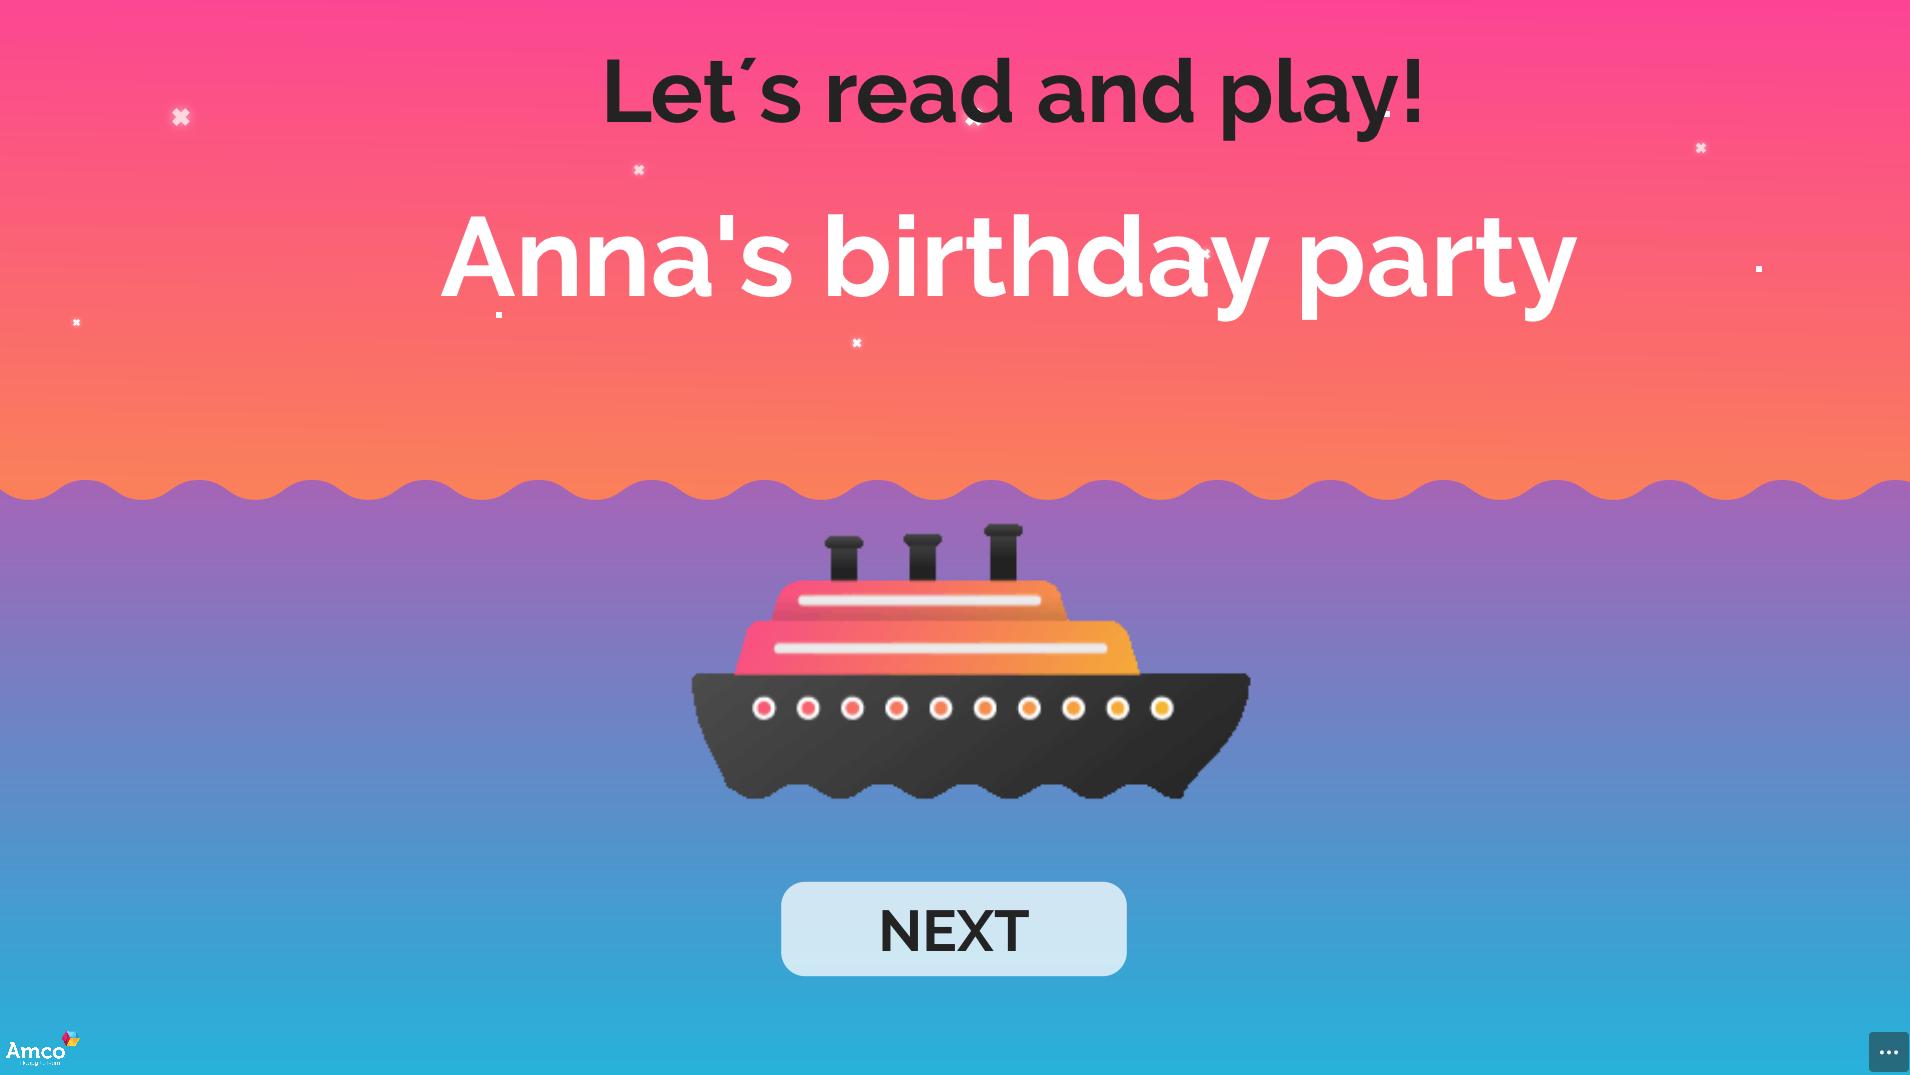 annas-birthday